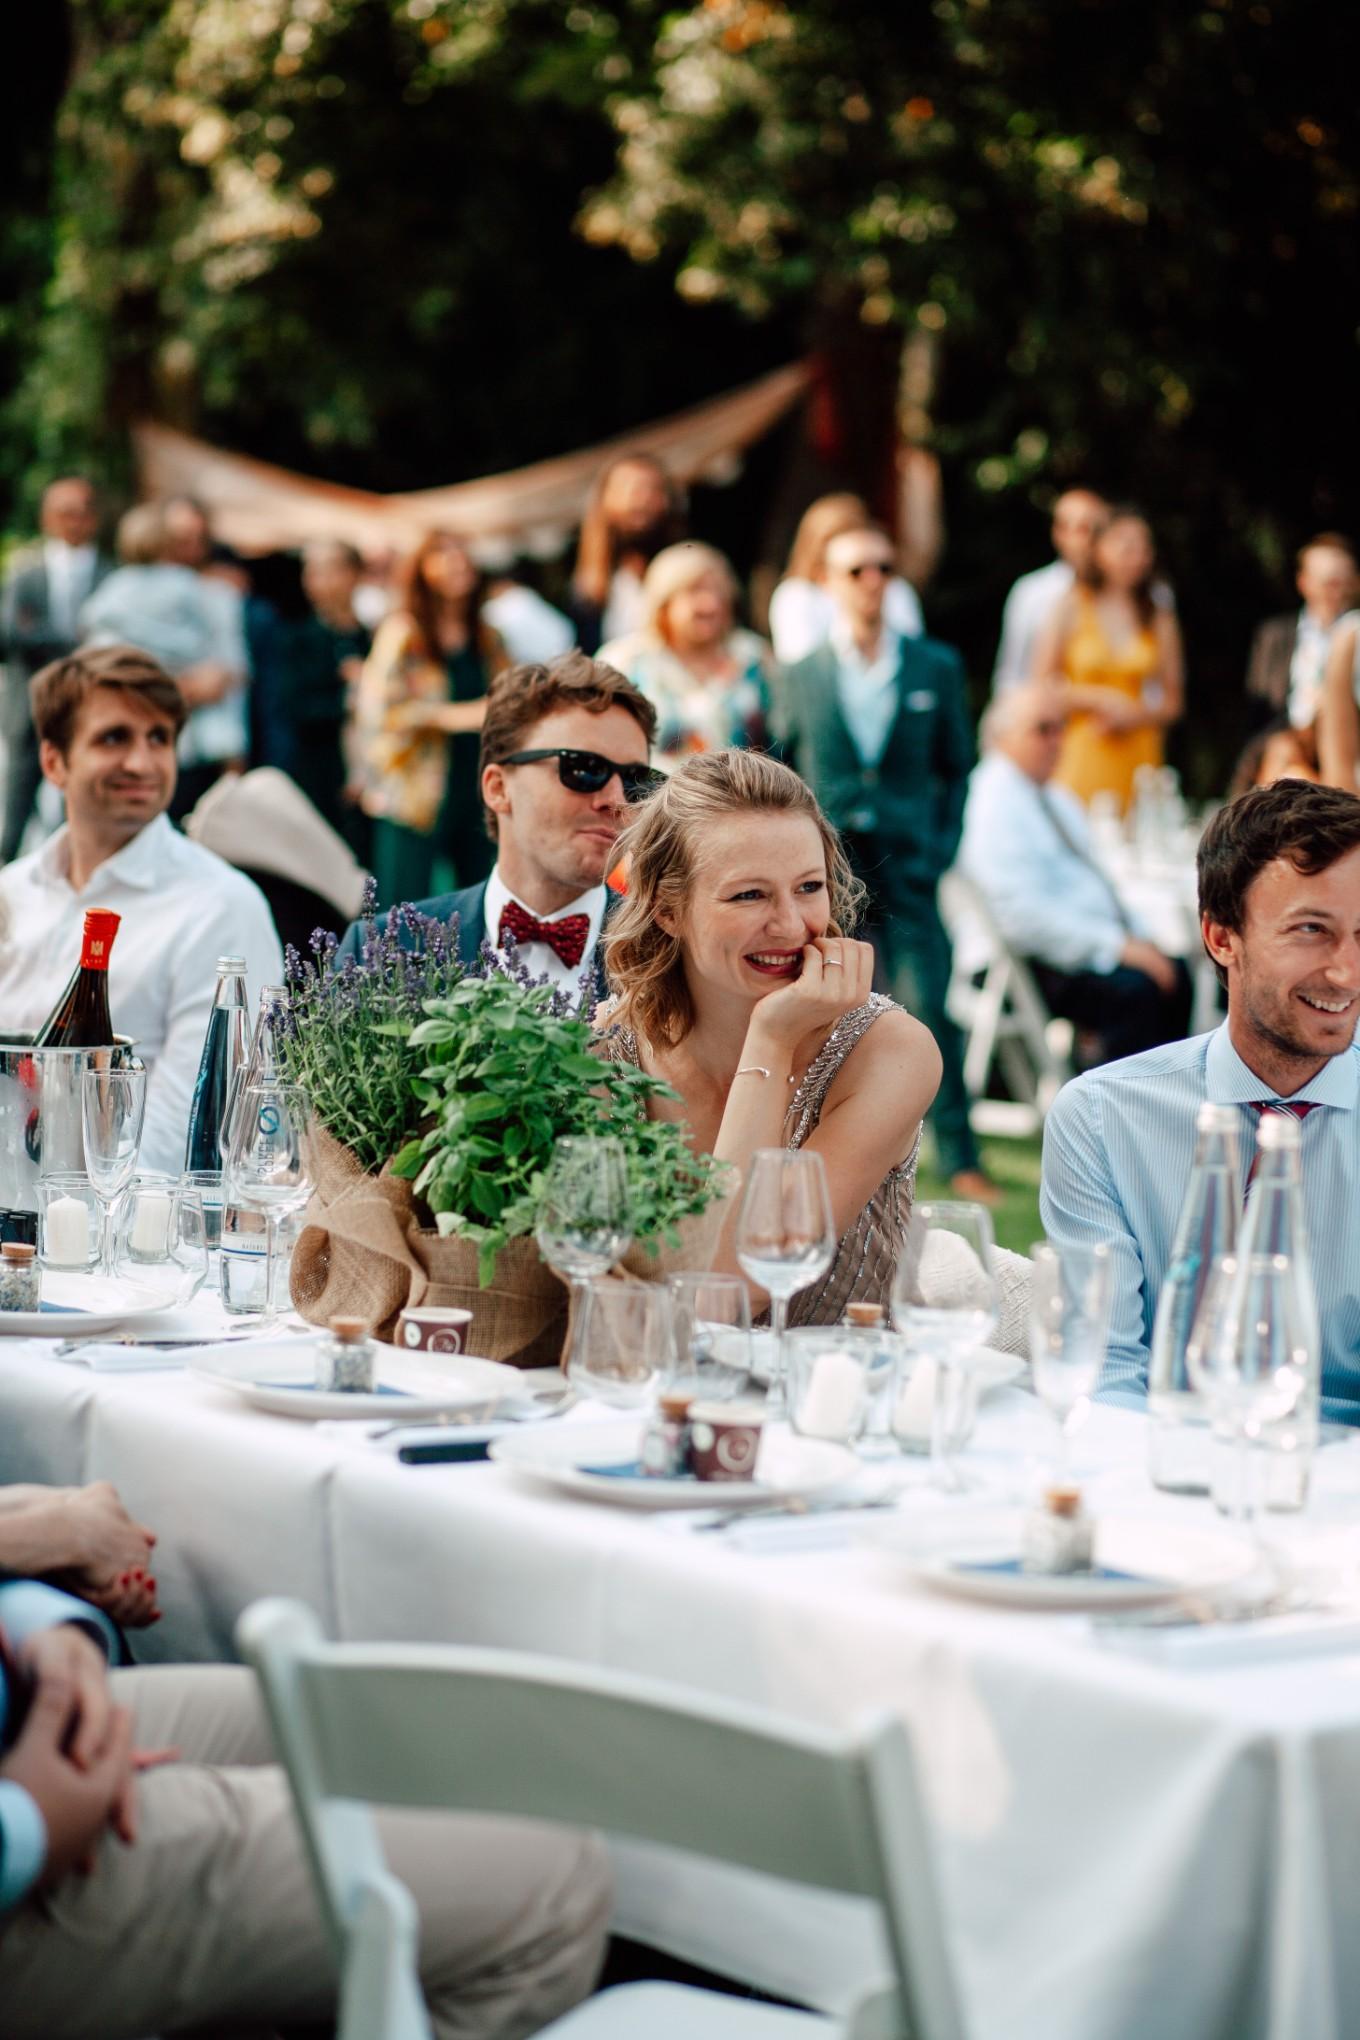 Berlin-Wannsee-Pia-Anna-Christian-Wedding-Photography-ST-61.jpg